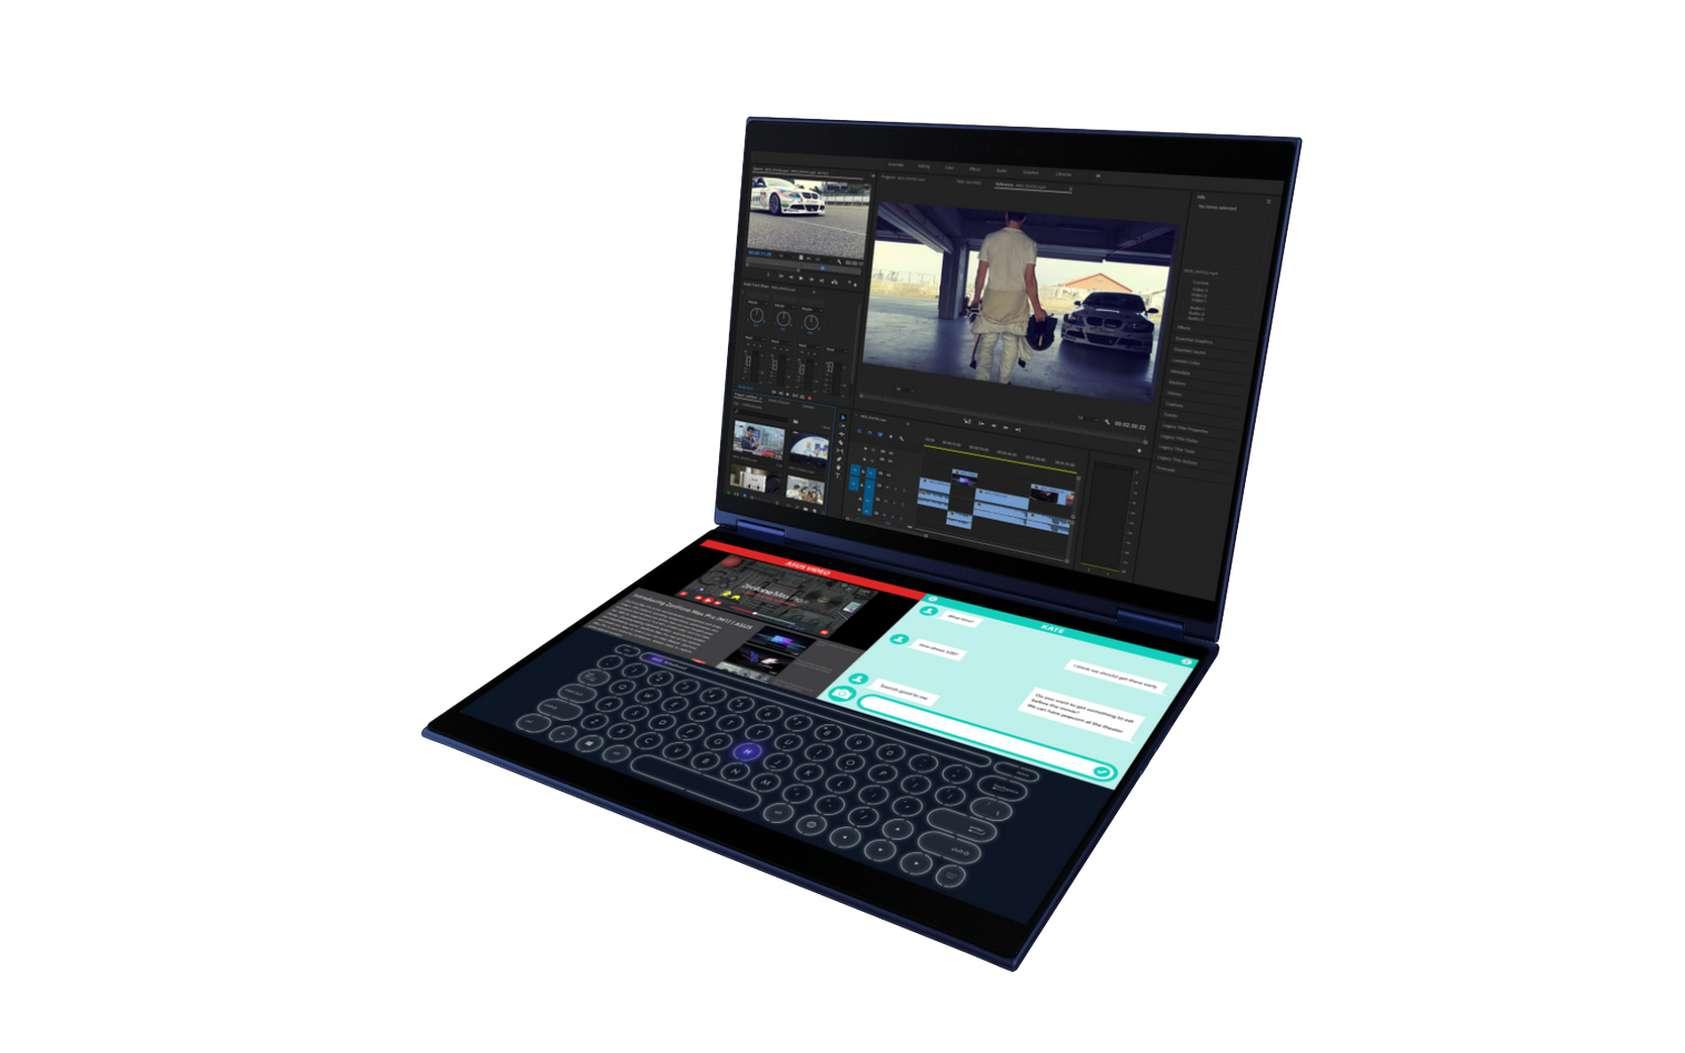 Le PC portable hybride Precog, d'Asus. © Asus